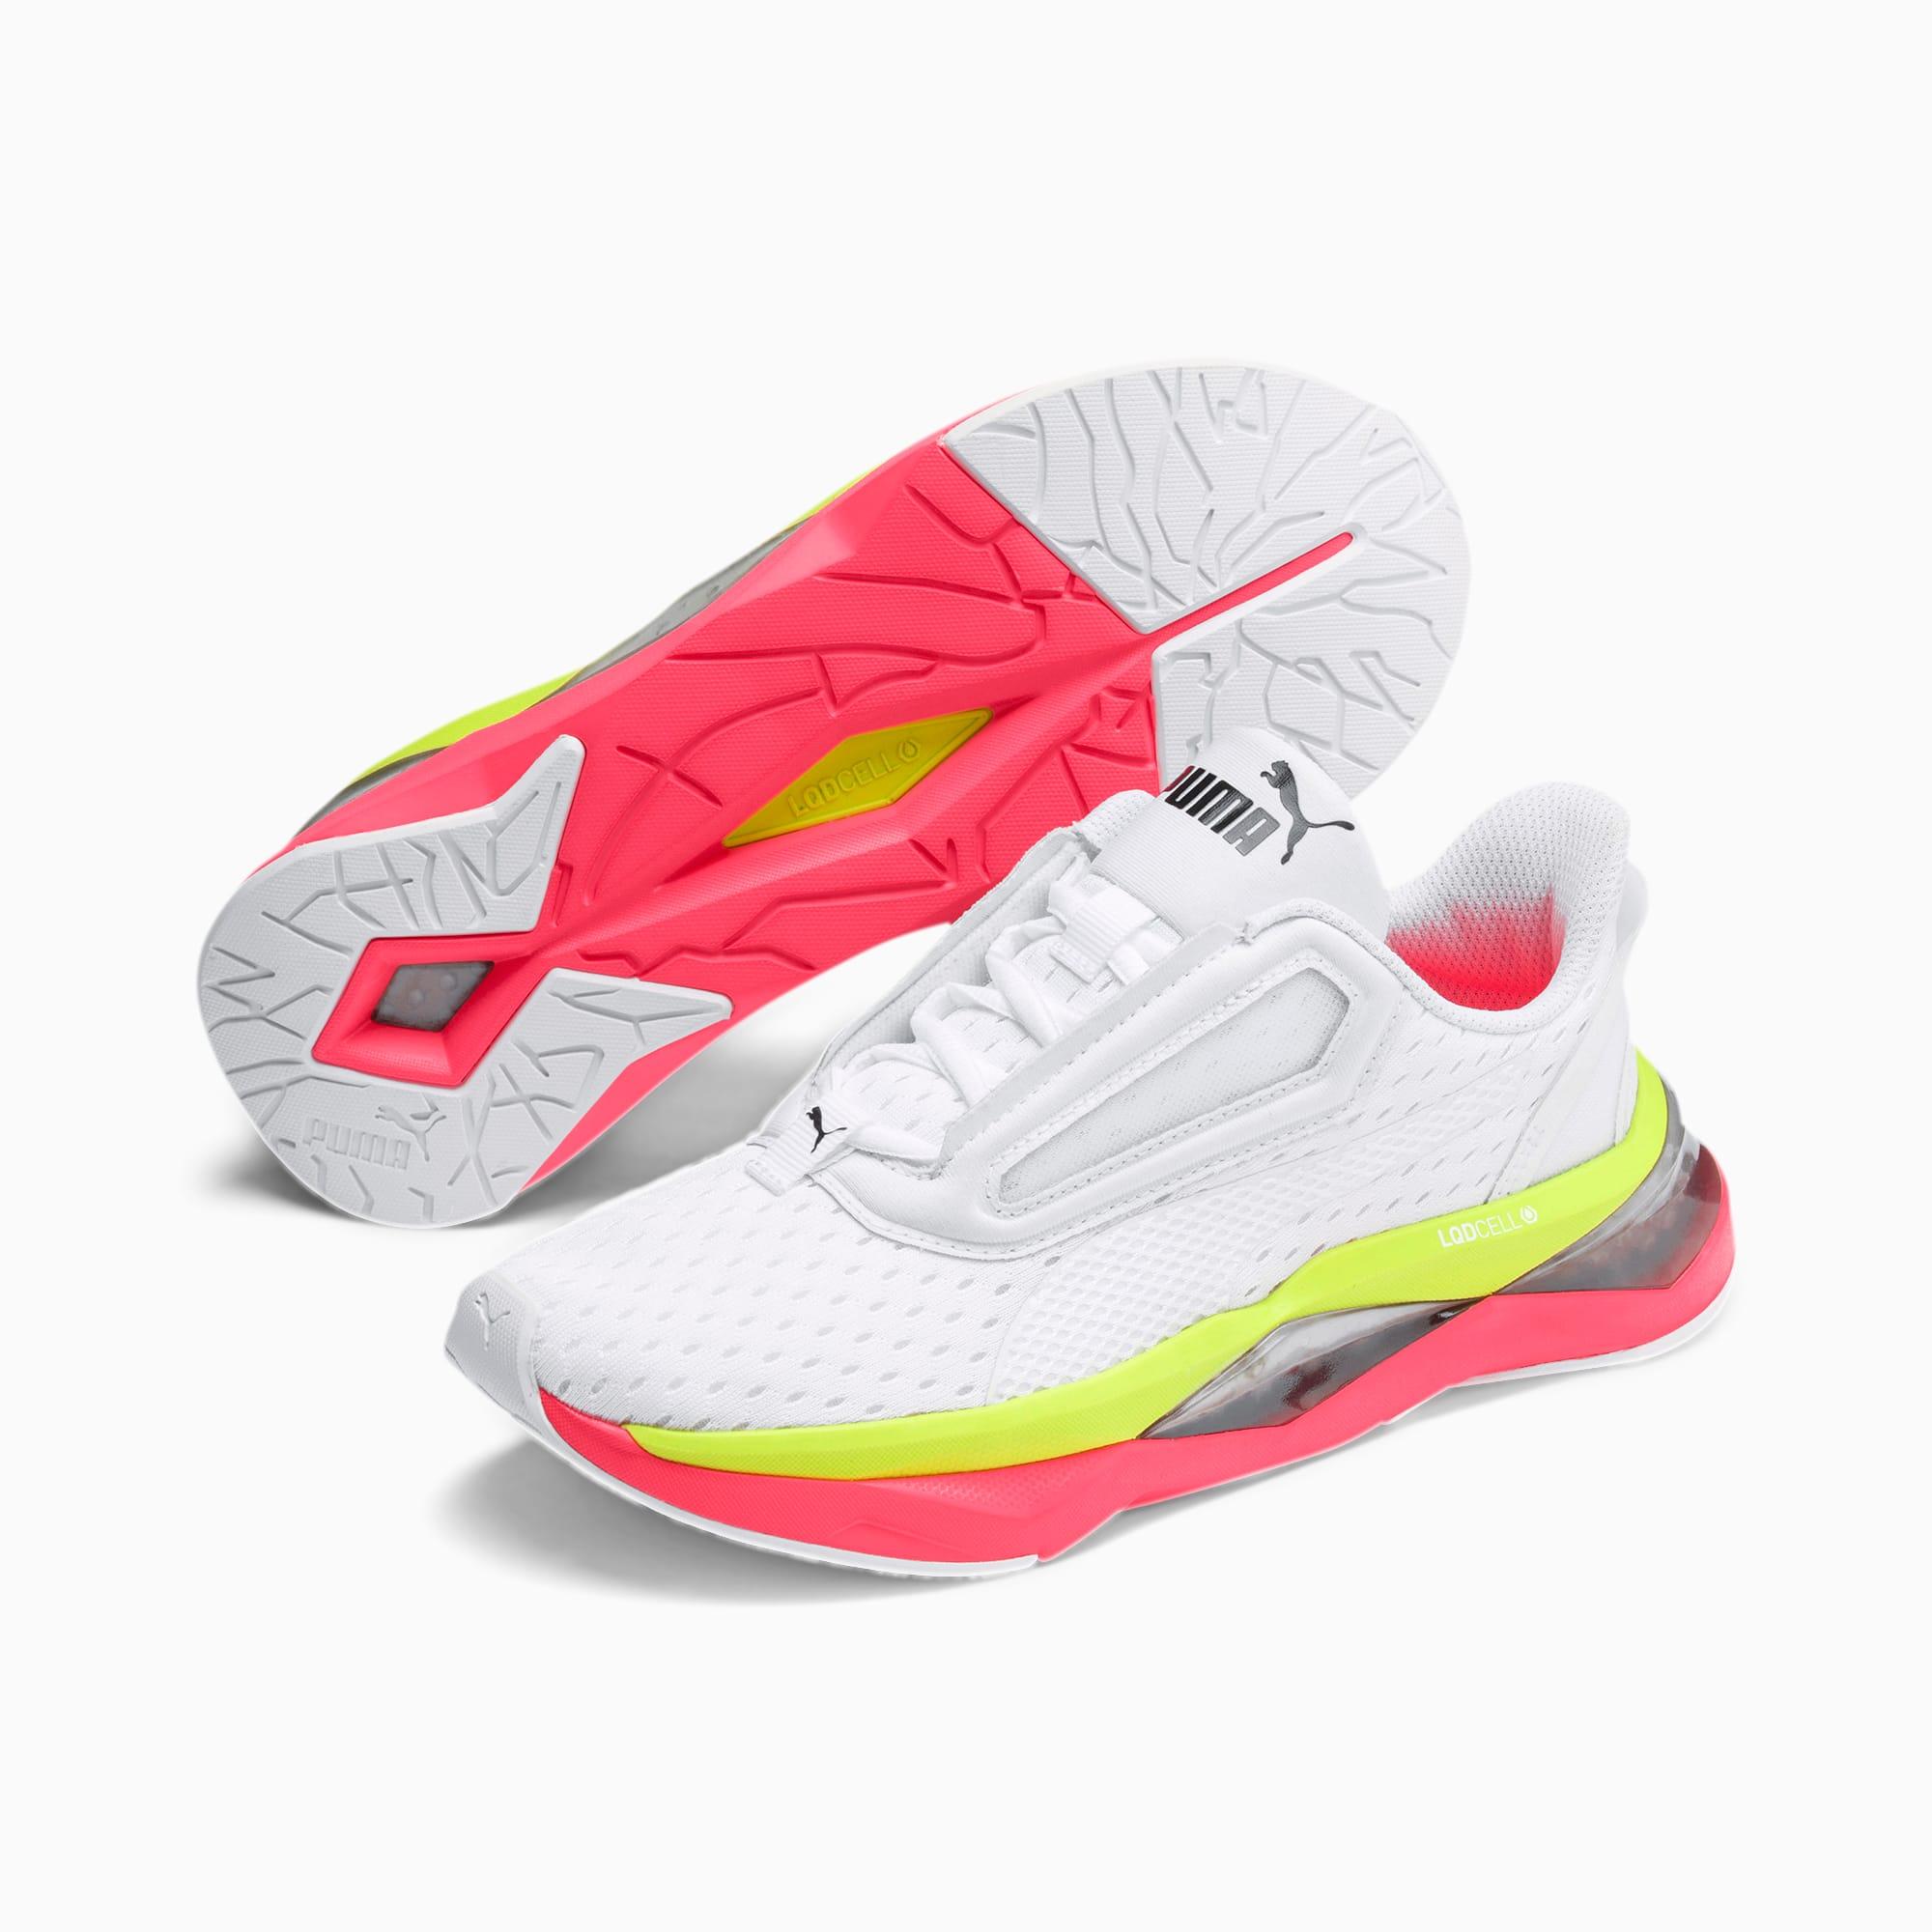 Damskie buty treningowe LQDCell Shatter XT